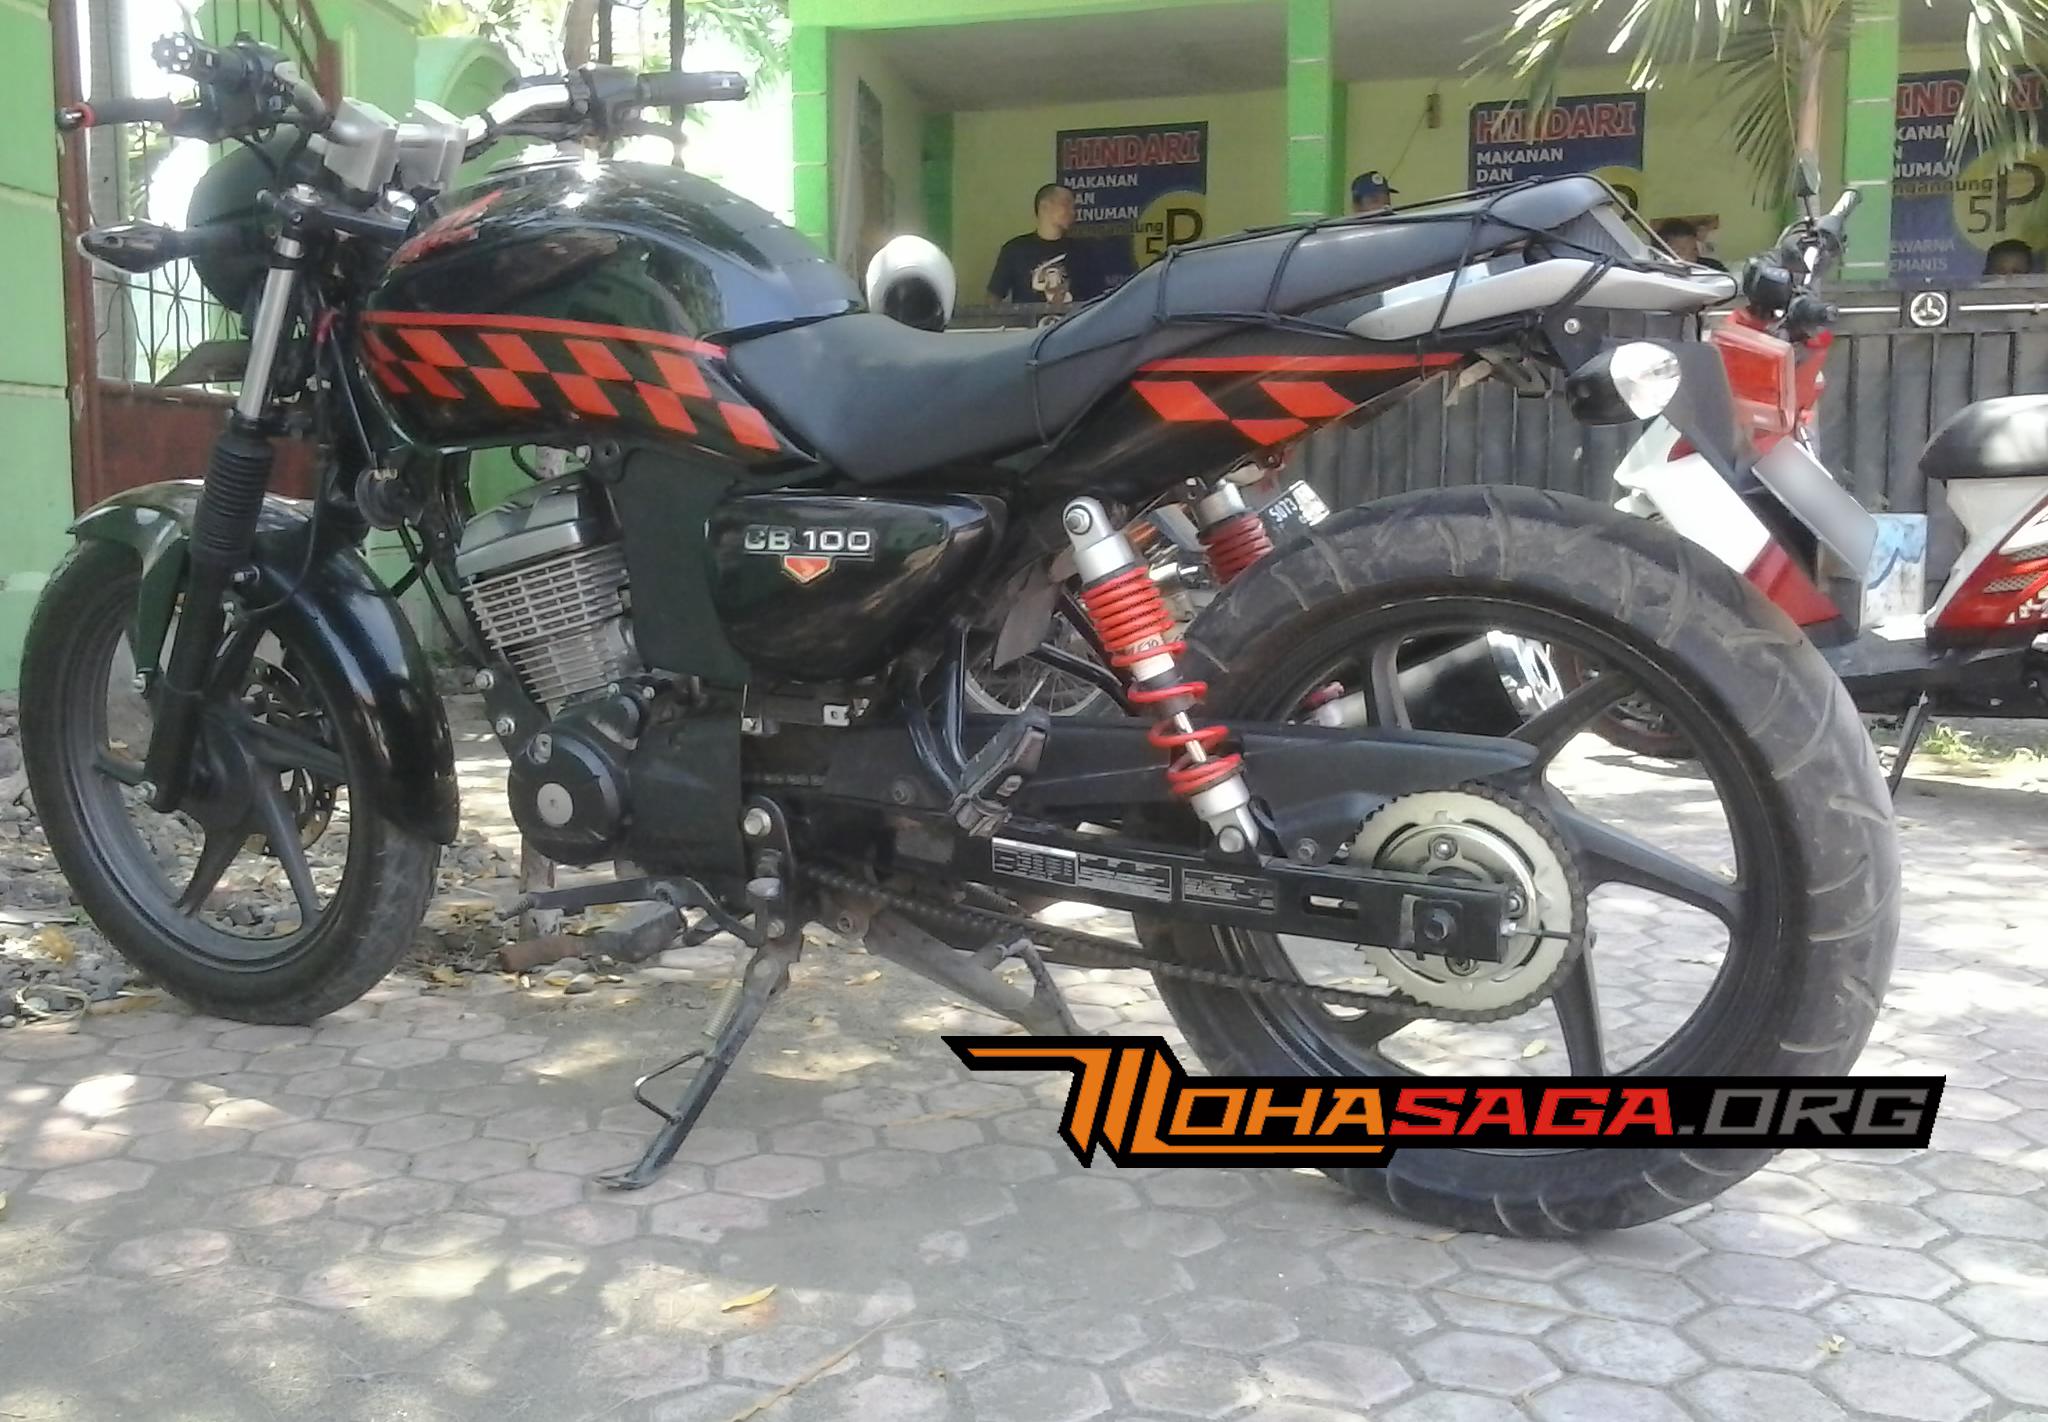 102 Modifikasi Motor Verza Jadi Cb Modifikasi Motor Honda CB Terbaru